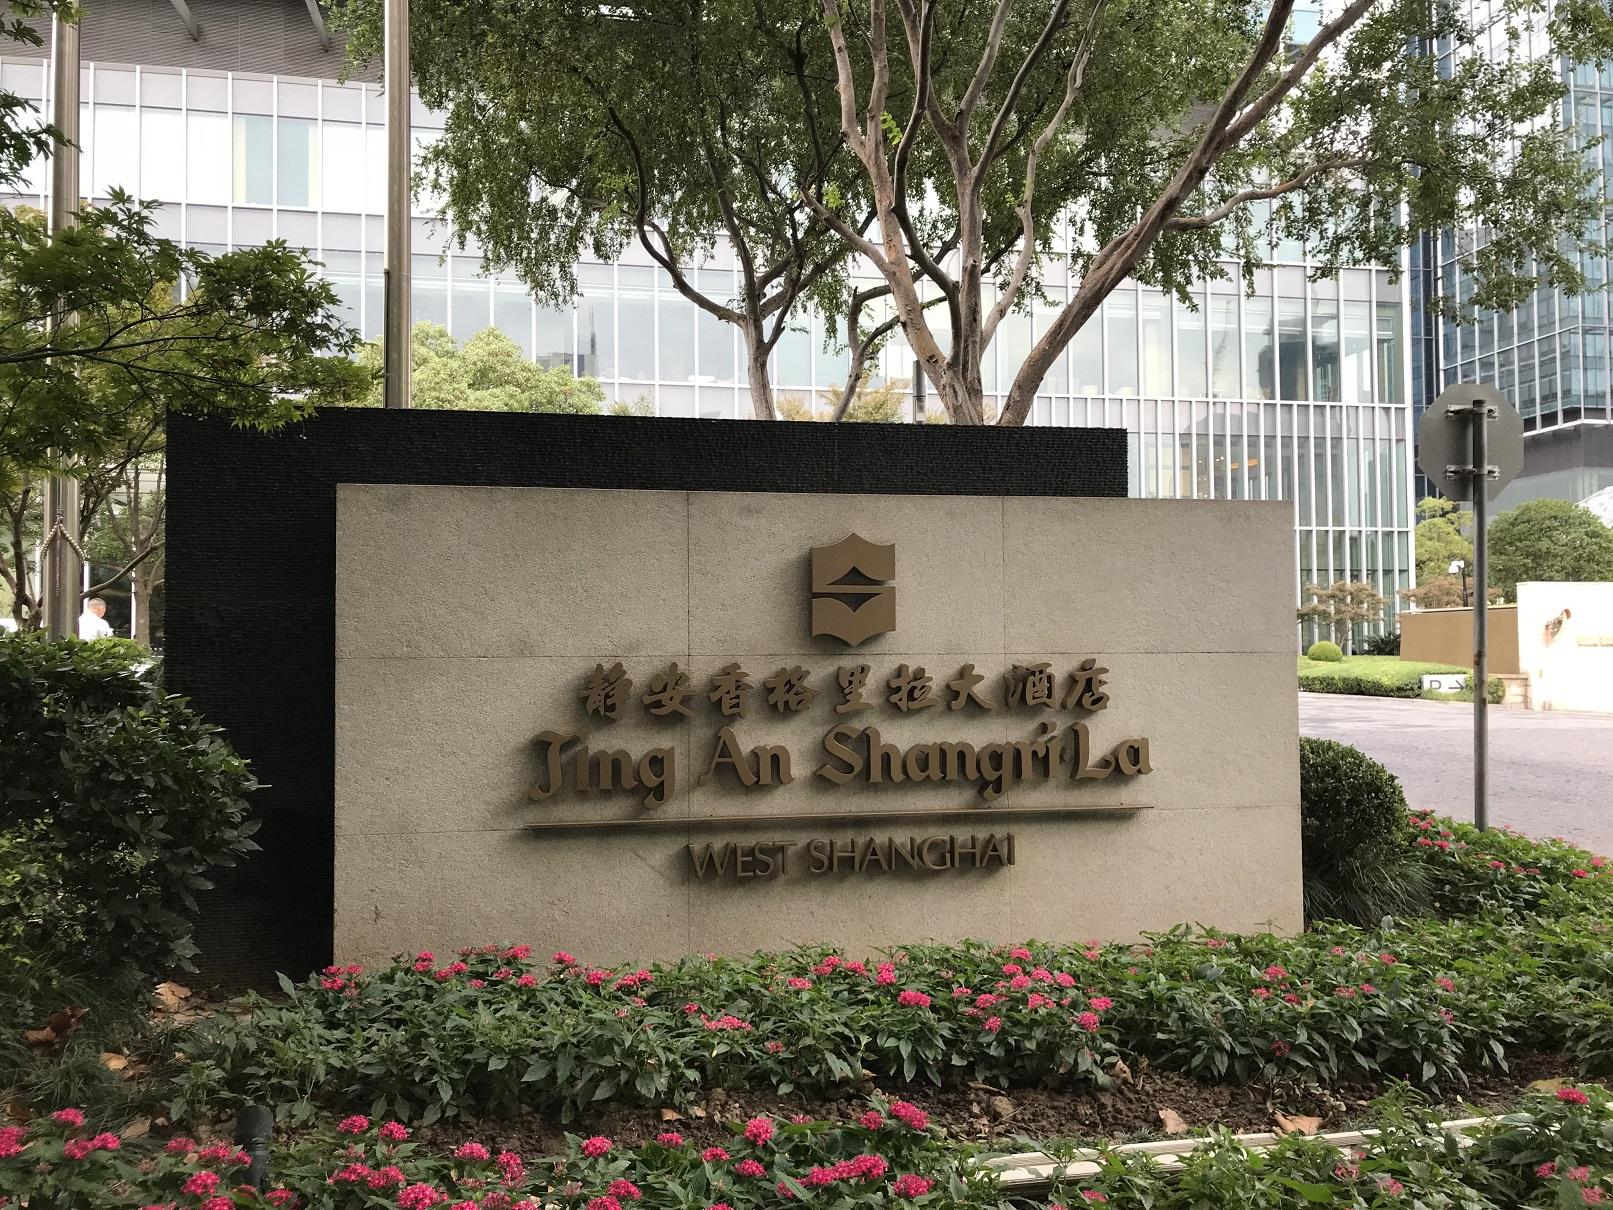 Shangri-la Jing An